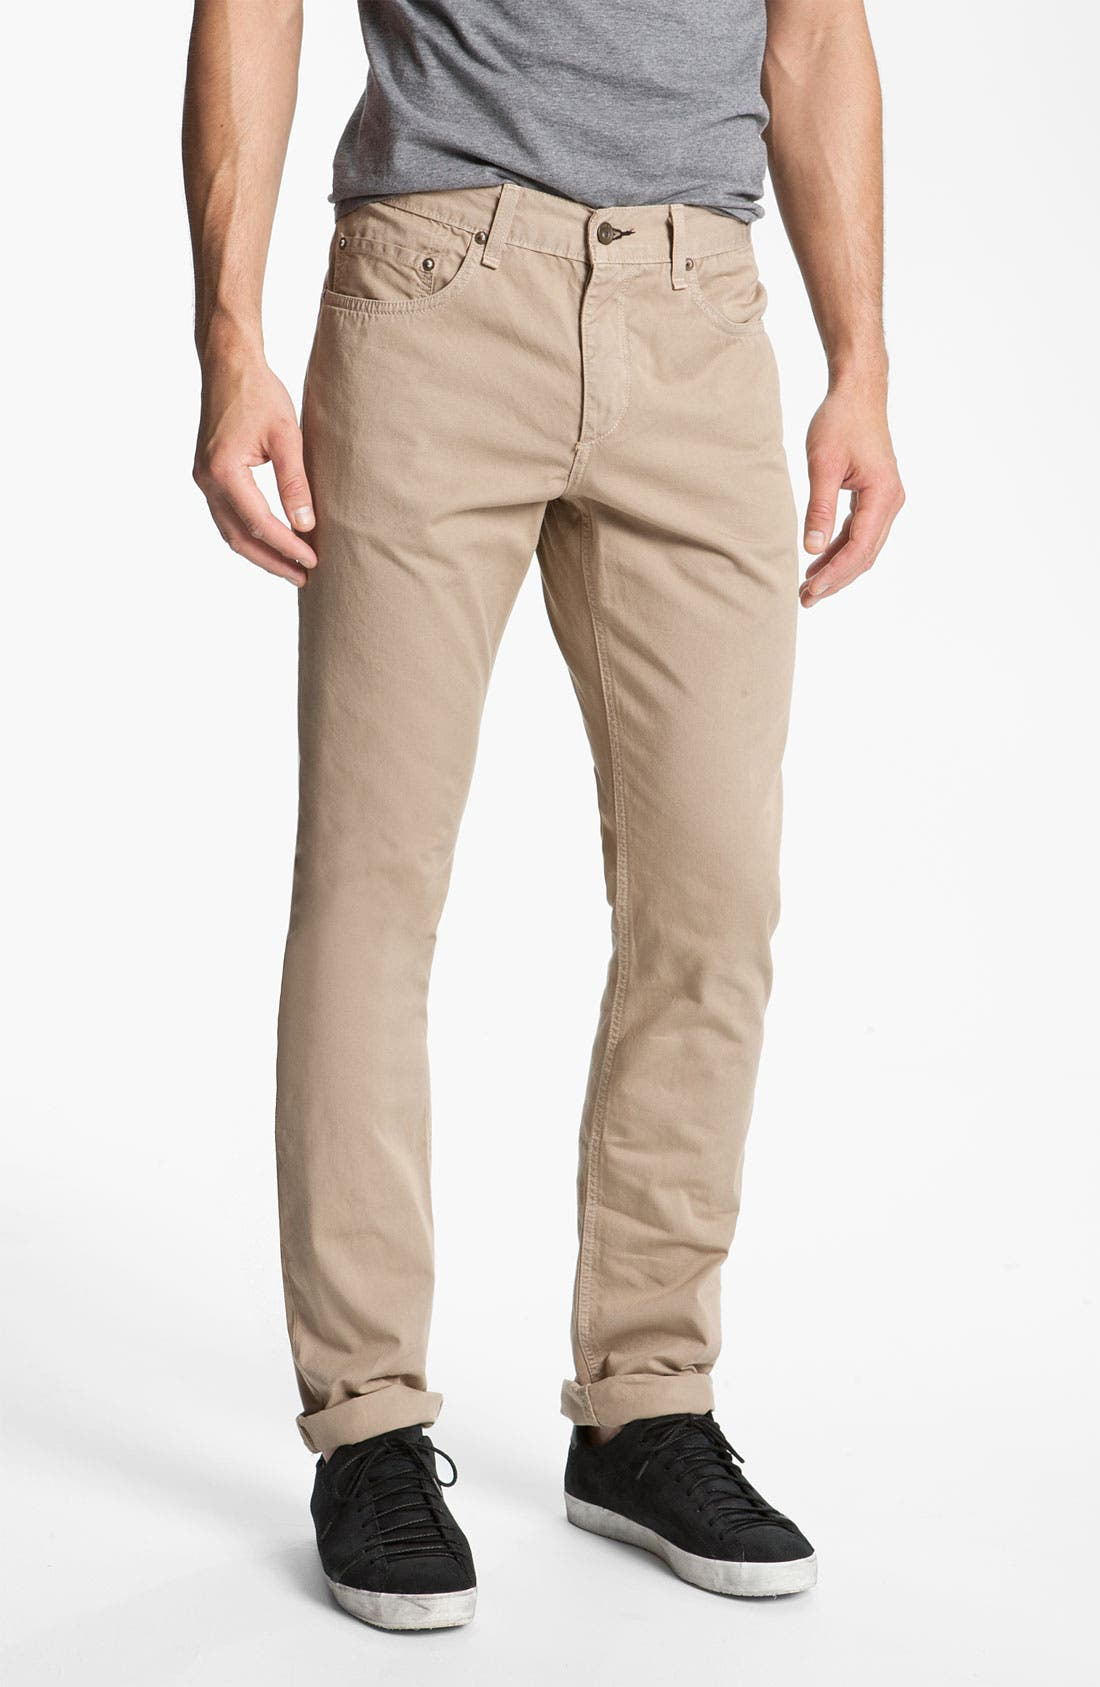 Alternate Image 1 Selected - rag & bone 'RB15X' Slim Straight Leg Jeans